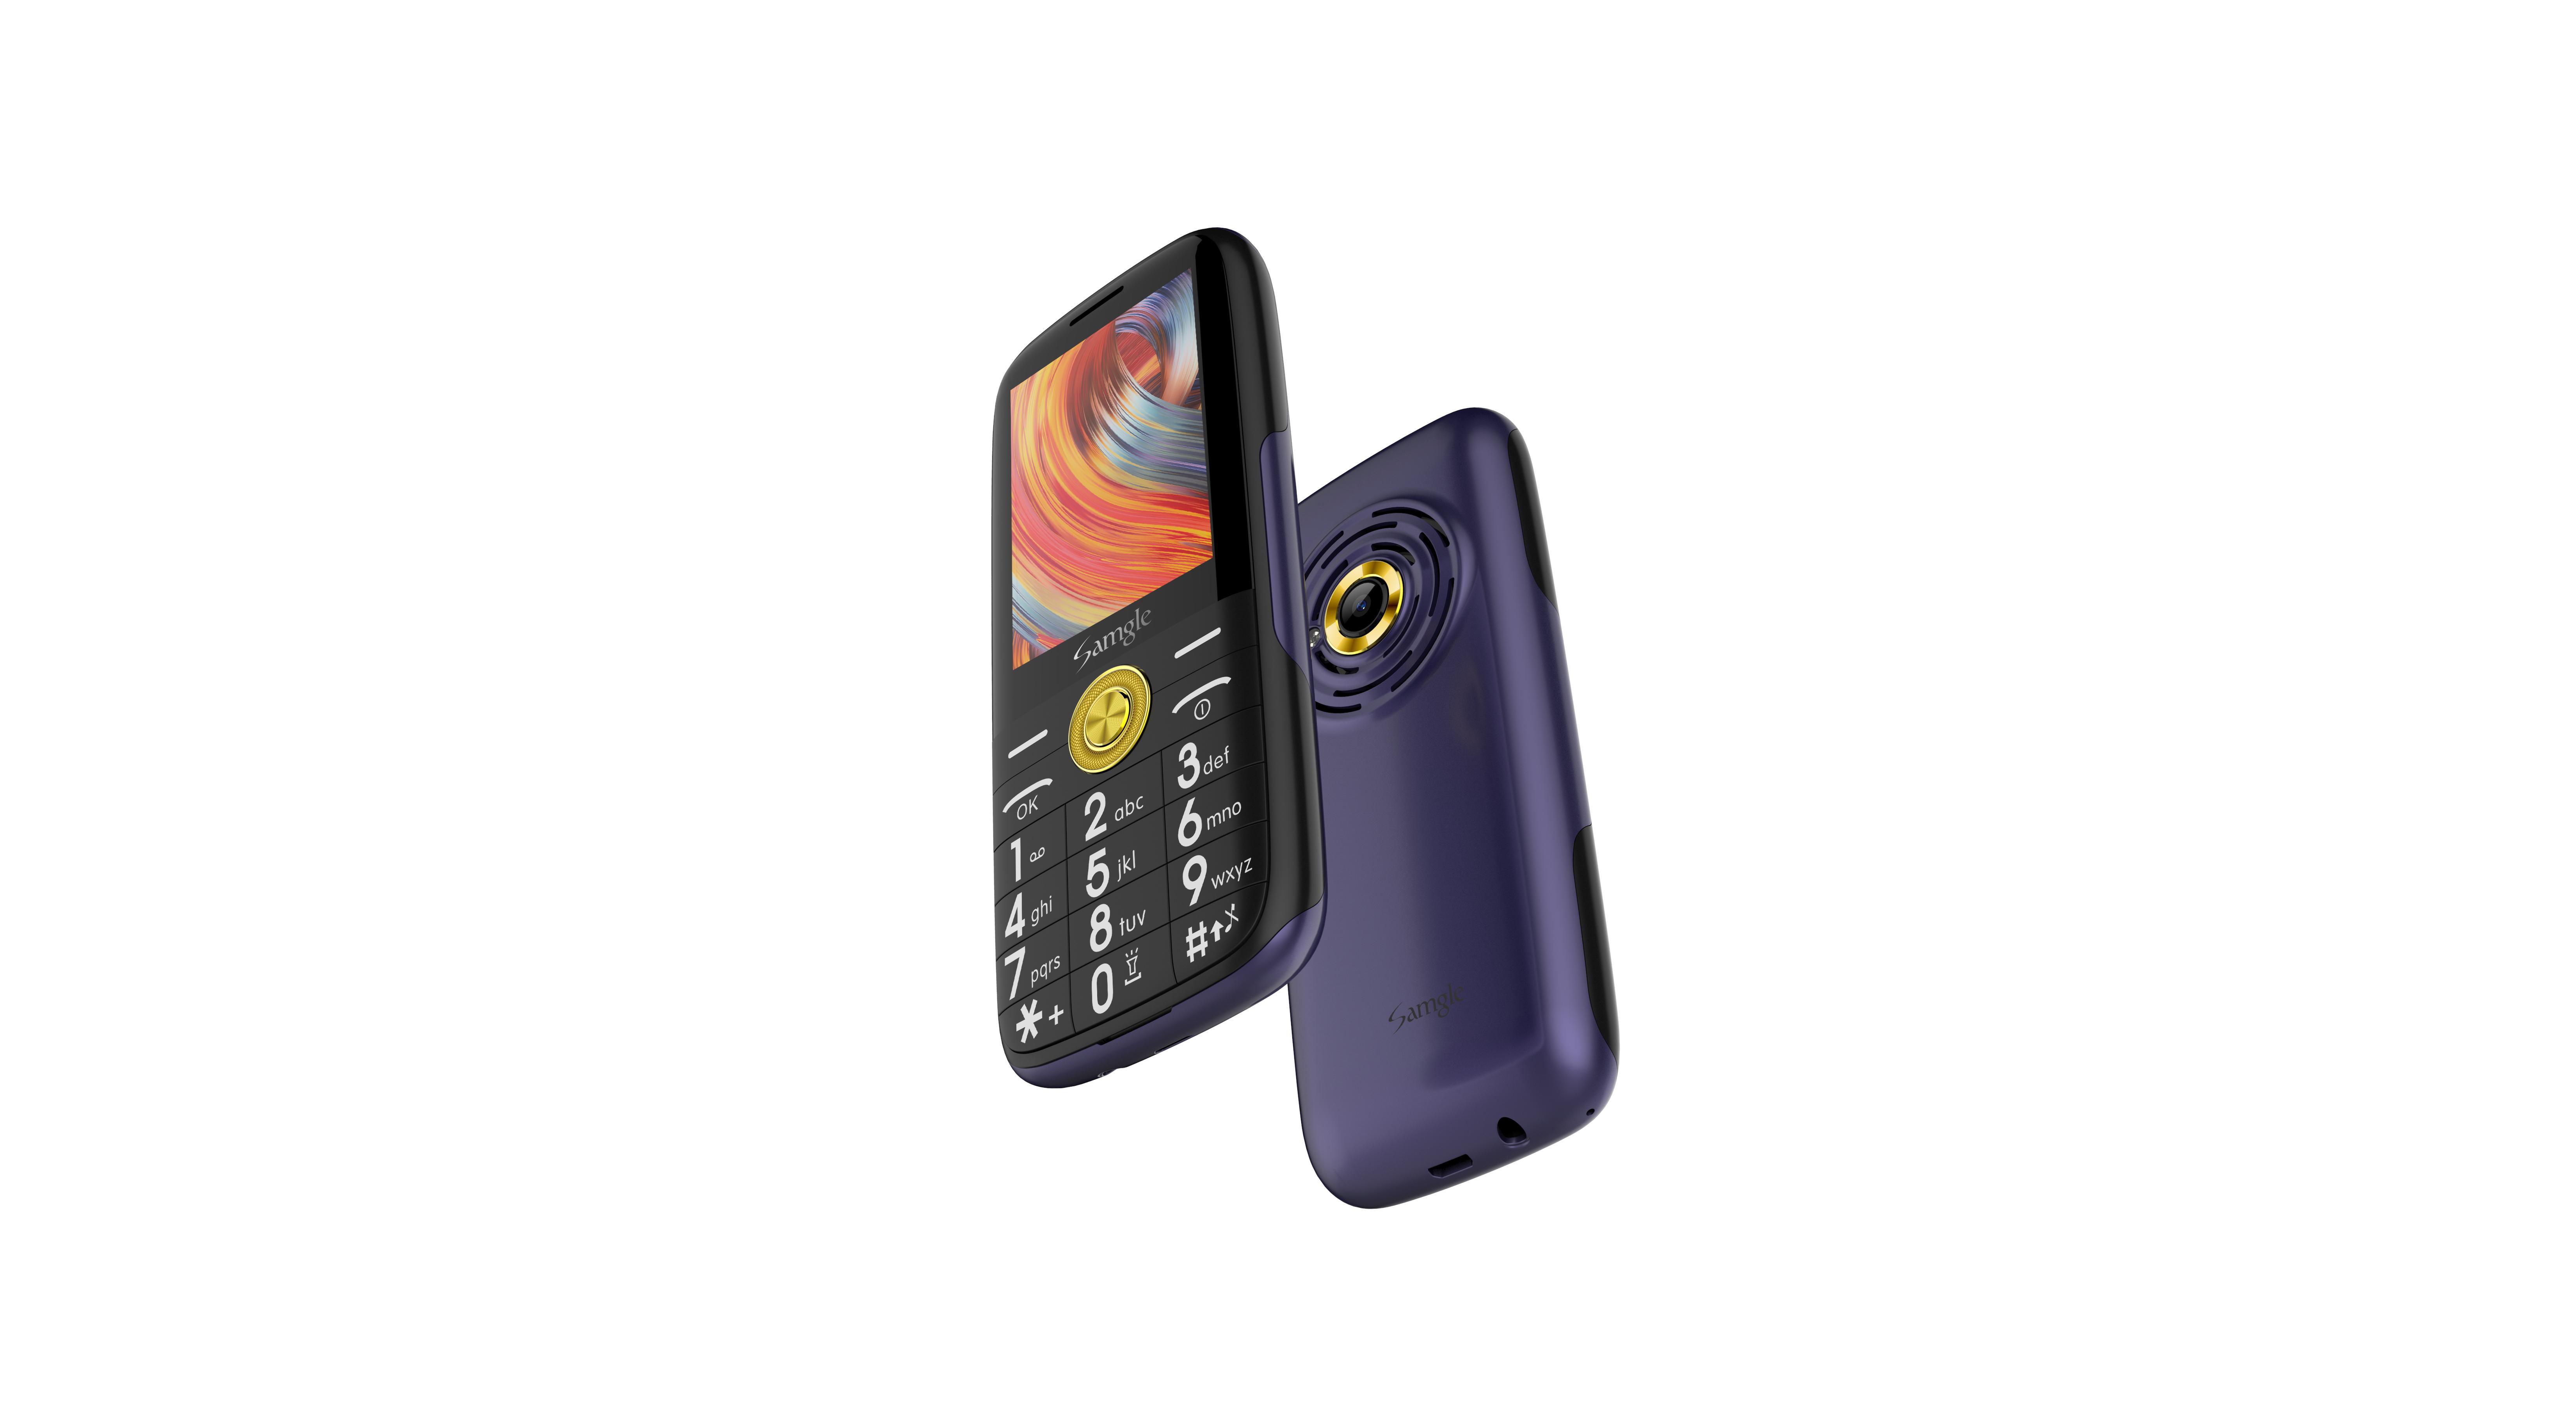 Telefon mobil Samgle Captain 3G, QVGA 2.4 inch, Bluetooth, Digi 3G, Camera, Slot Card, Radio FM, Internet, Dual SIM15